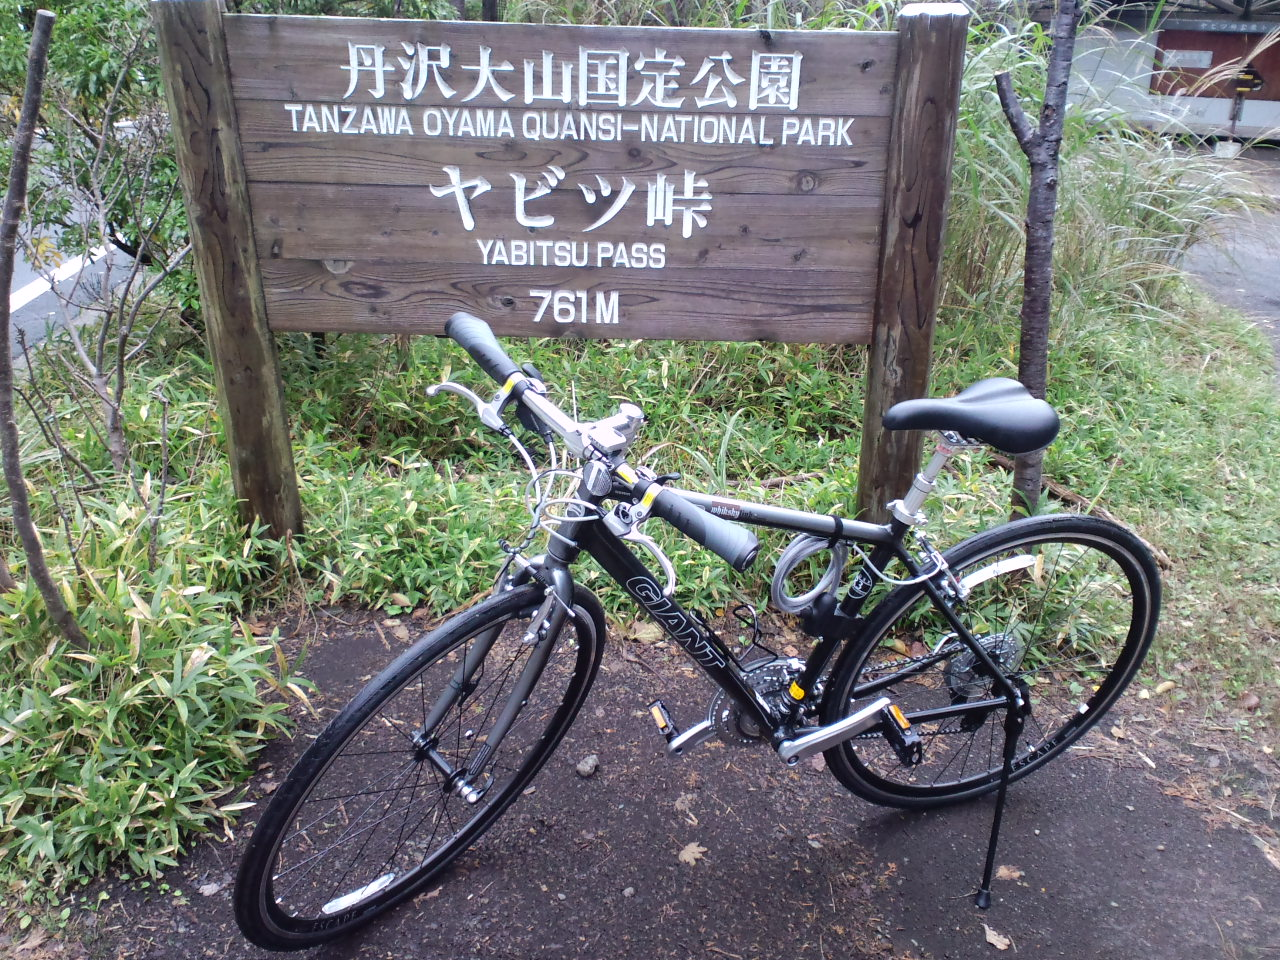 Whisky link 自転車部 神奈川支部だより 3